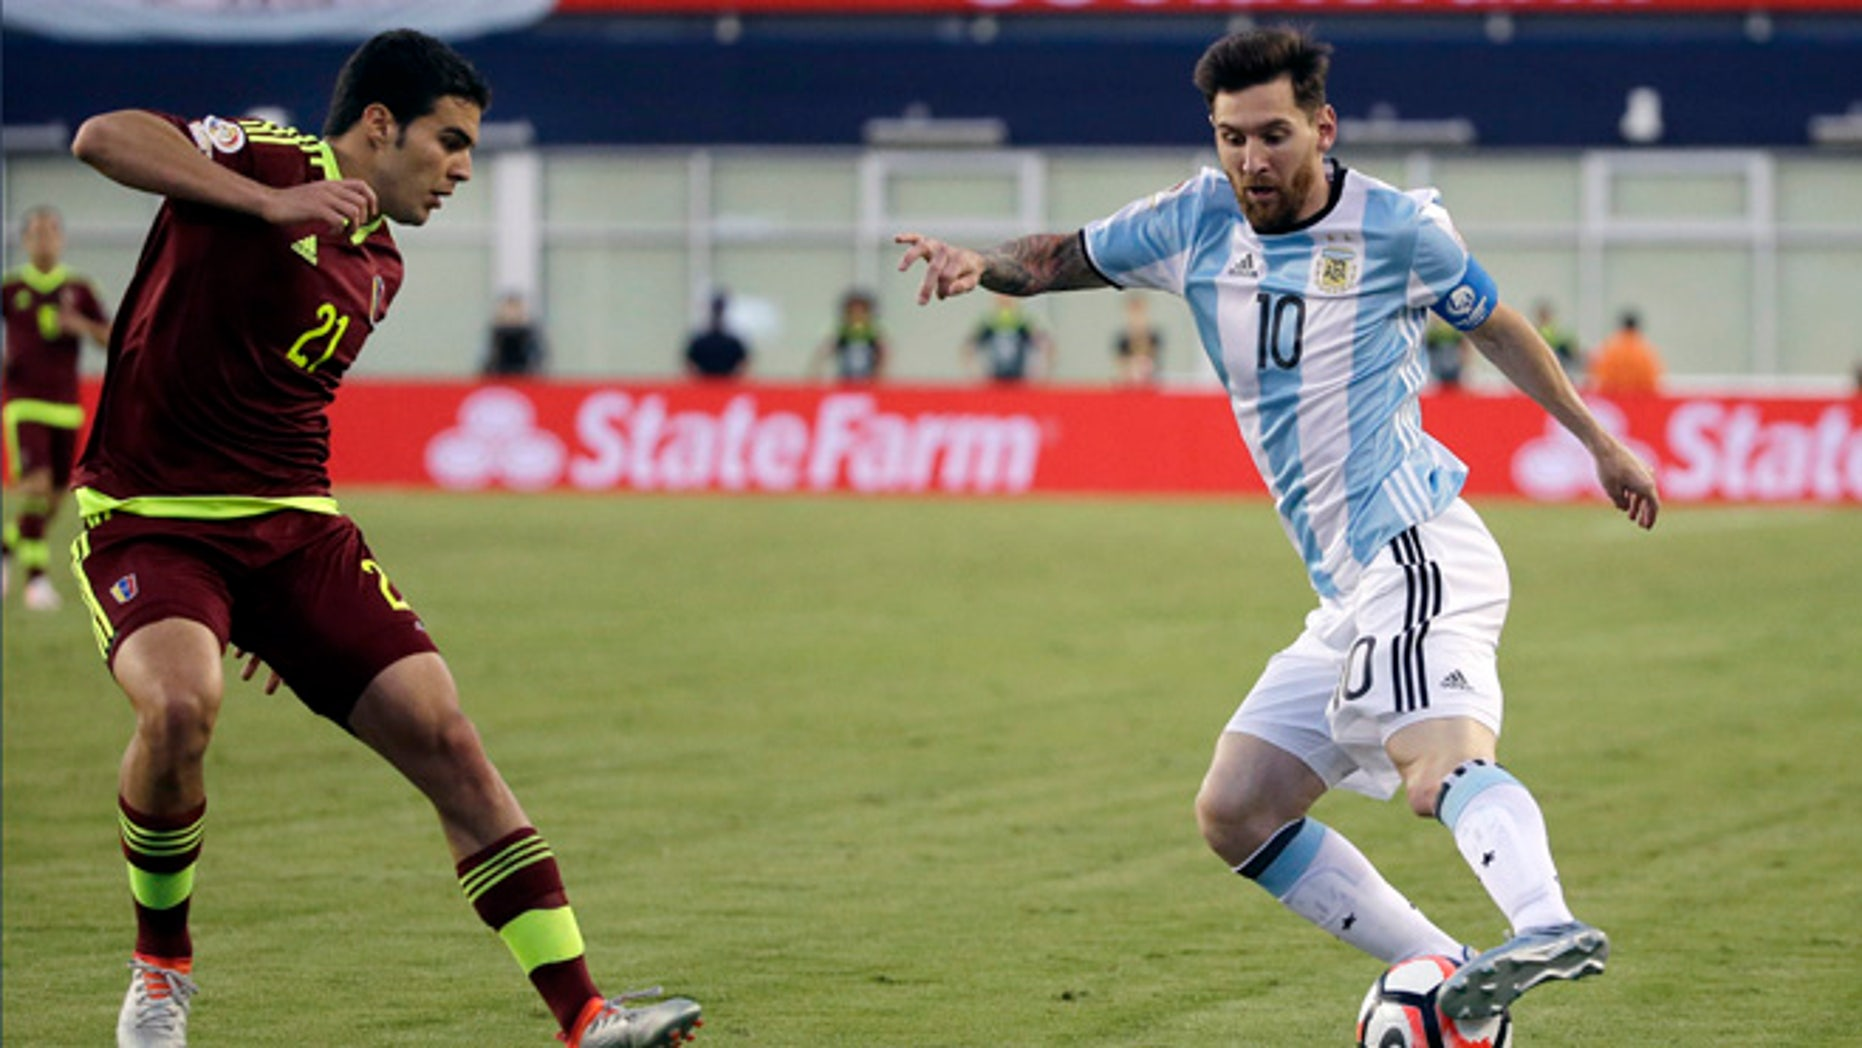 Argentina's Lionel Messi (10) dribbles the ball against Venezuela's Alexander Gonzalez (21) during the second half of a Copa America Centenario soccer quarterfinal Saturday, June 18, 2016, in Foxborough, Mass. (AP Photo/Elise Amendola)